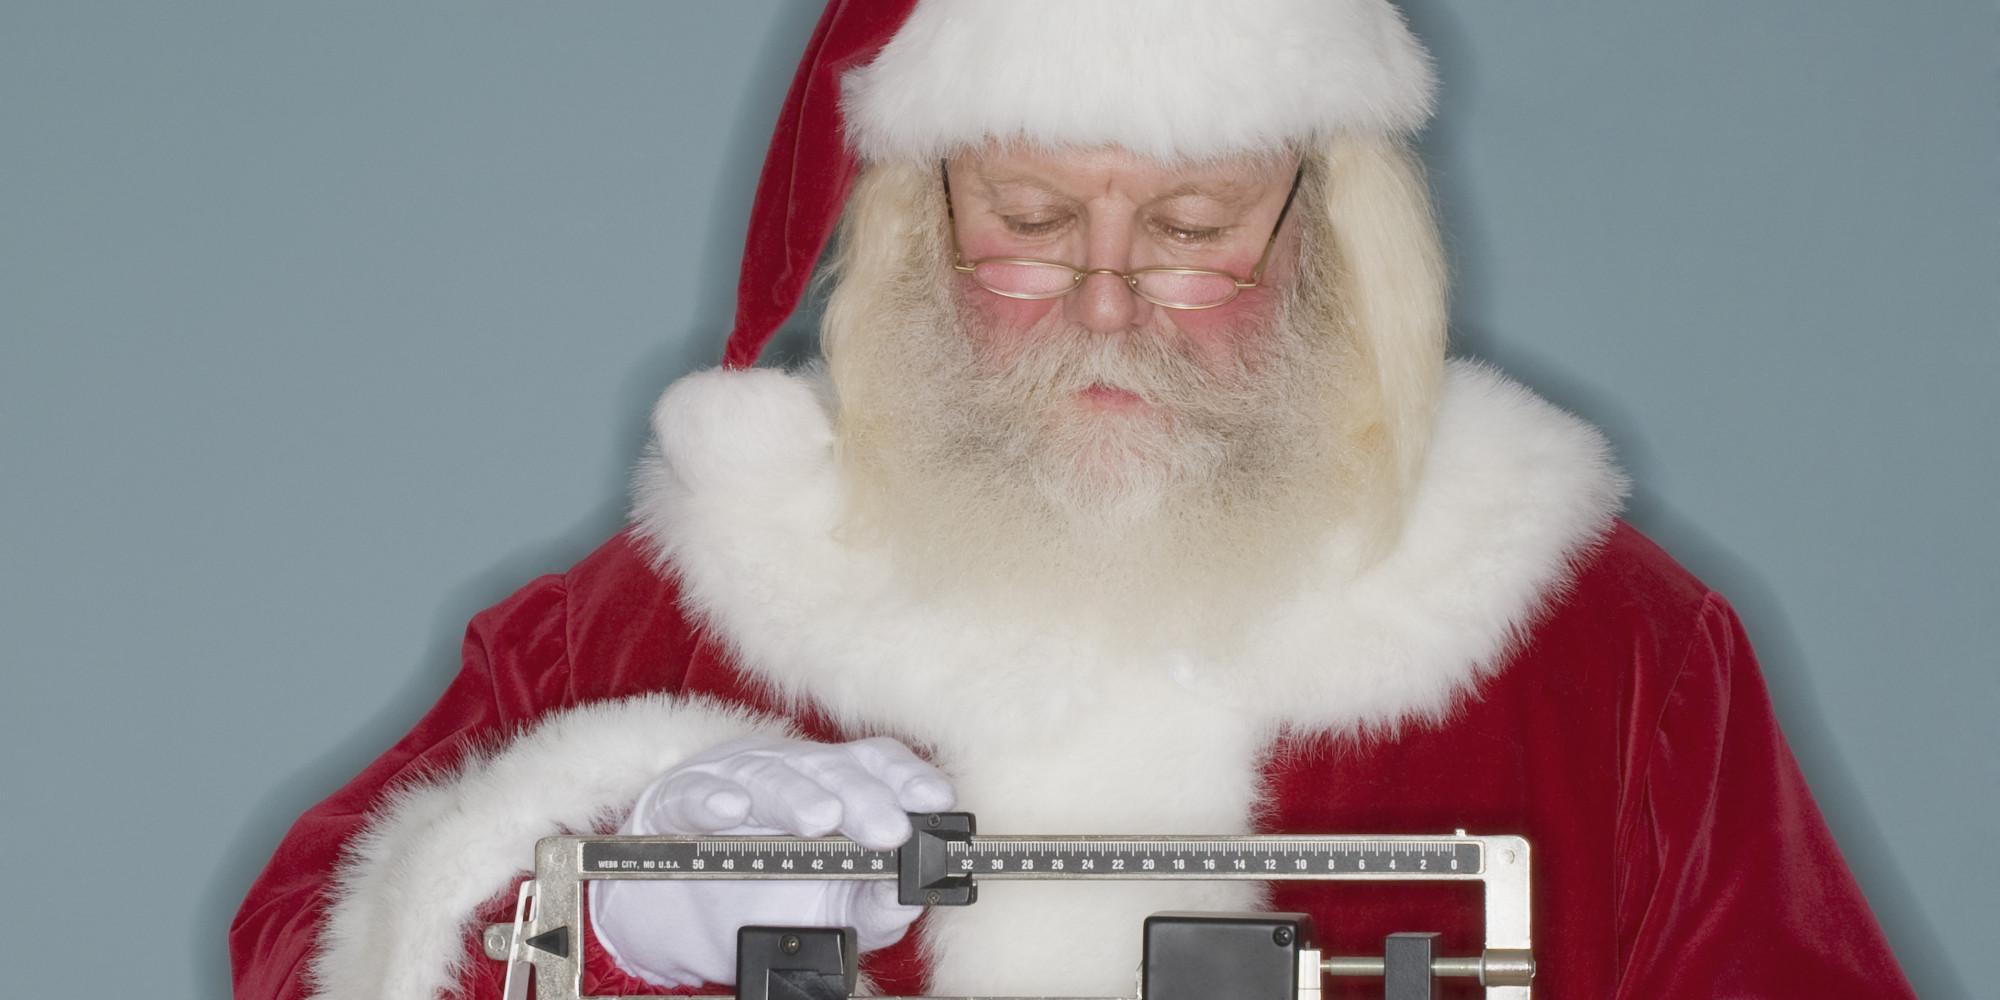 Bbw santa